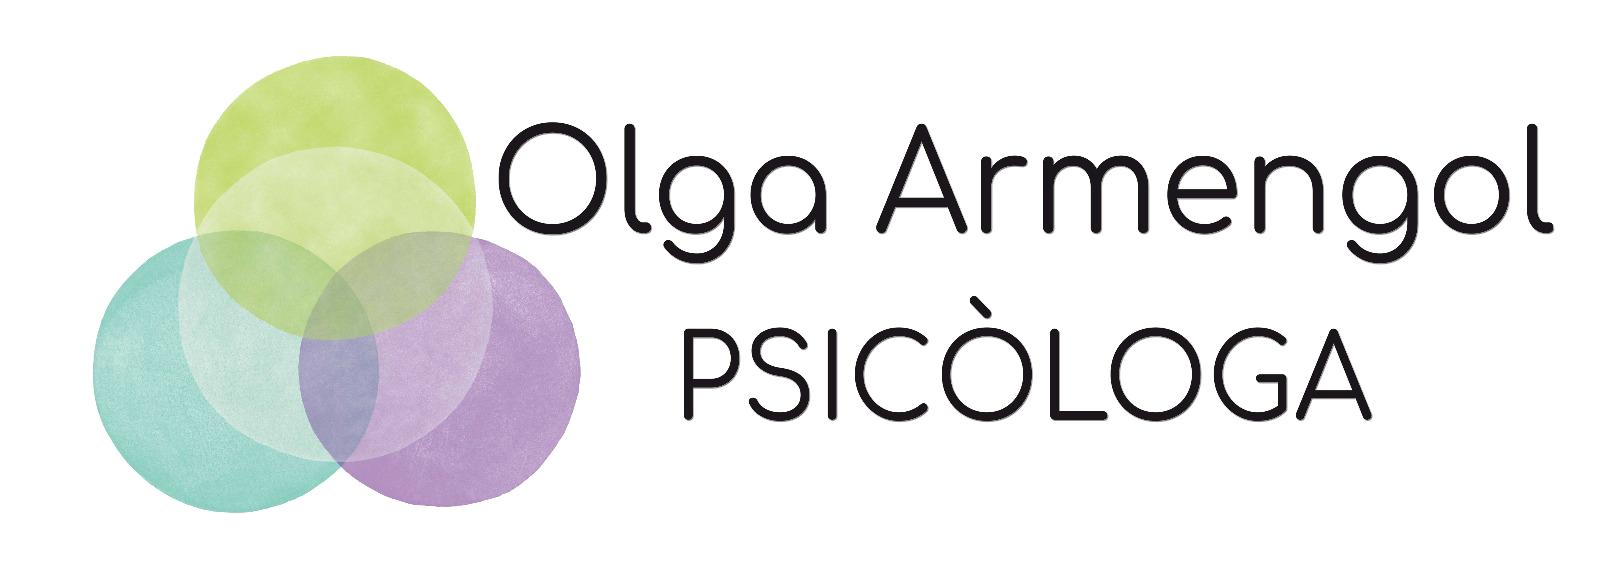 Olga Armengol